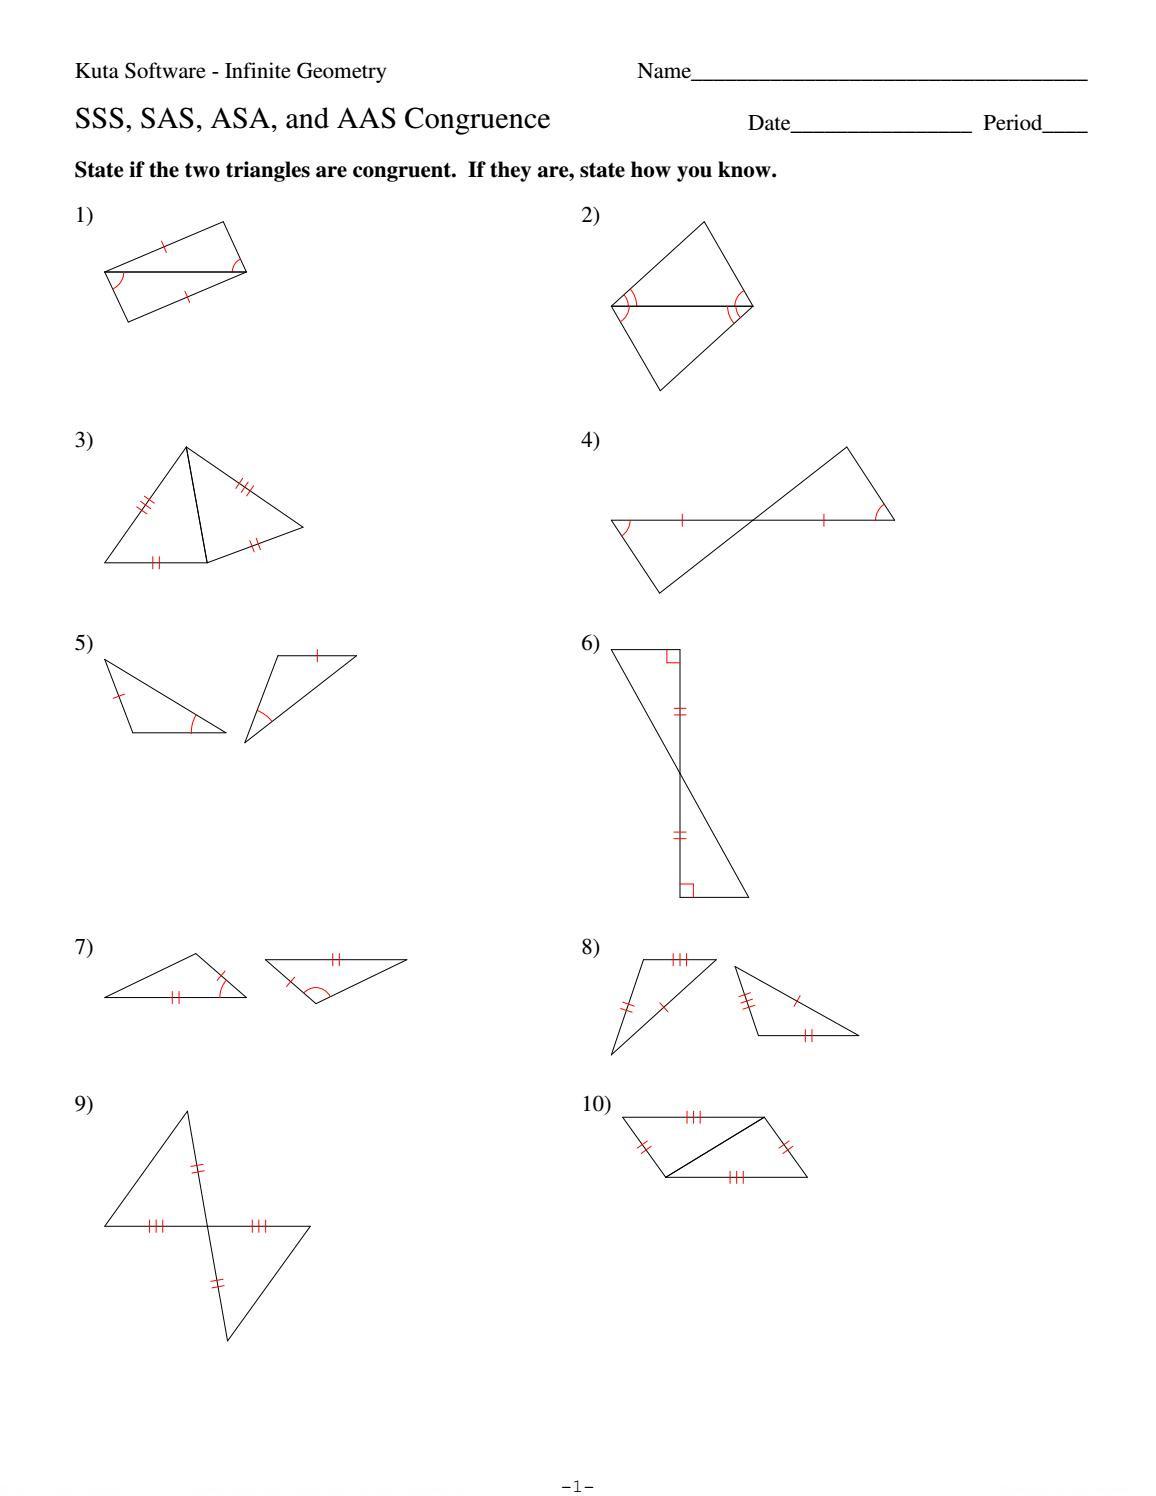 4 sss sas asa and aas congruence by HHS Geometry issuu